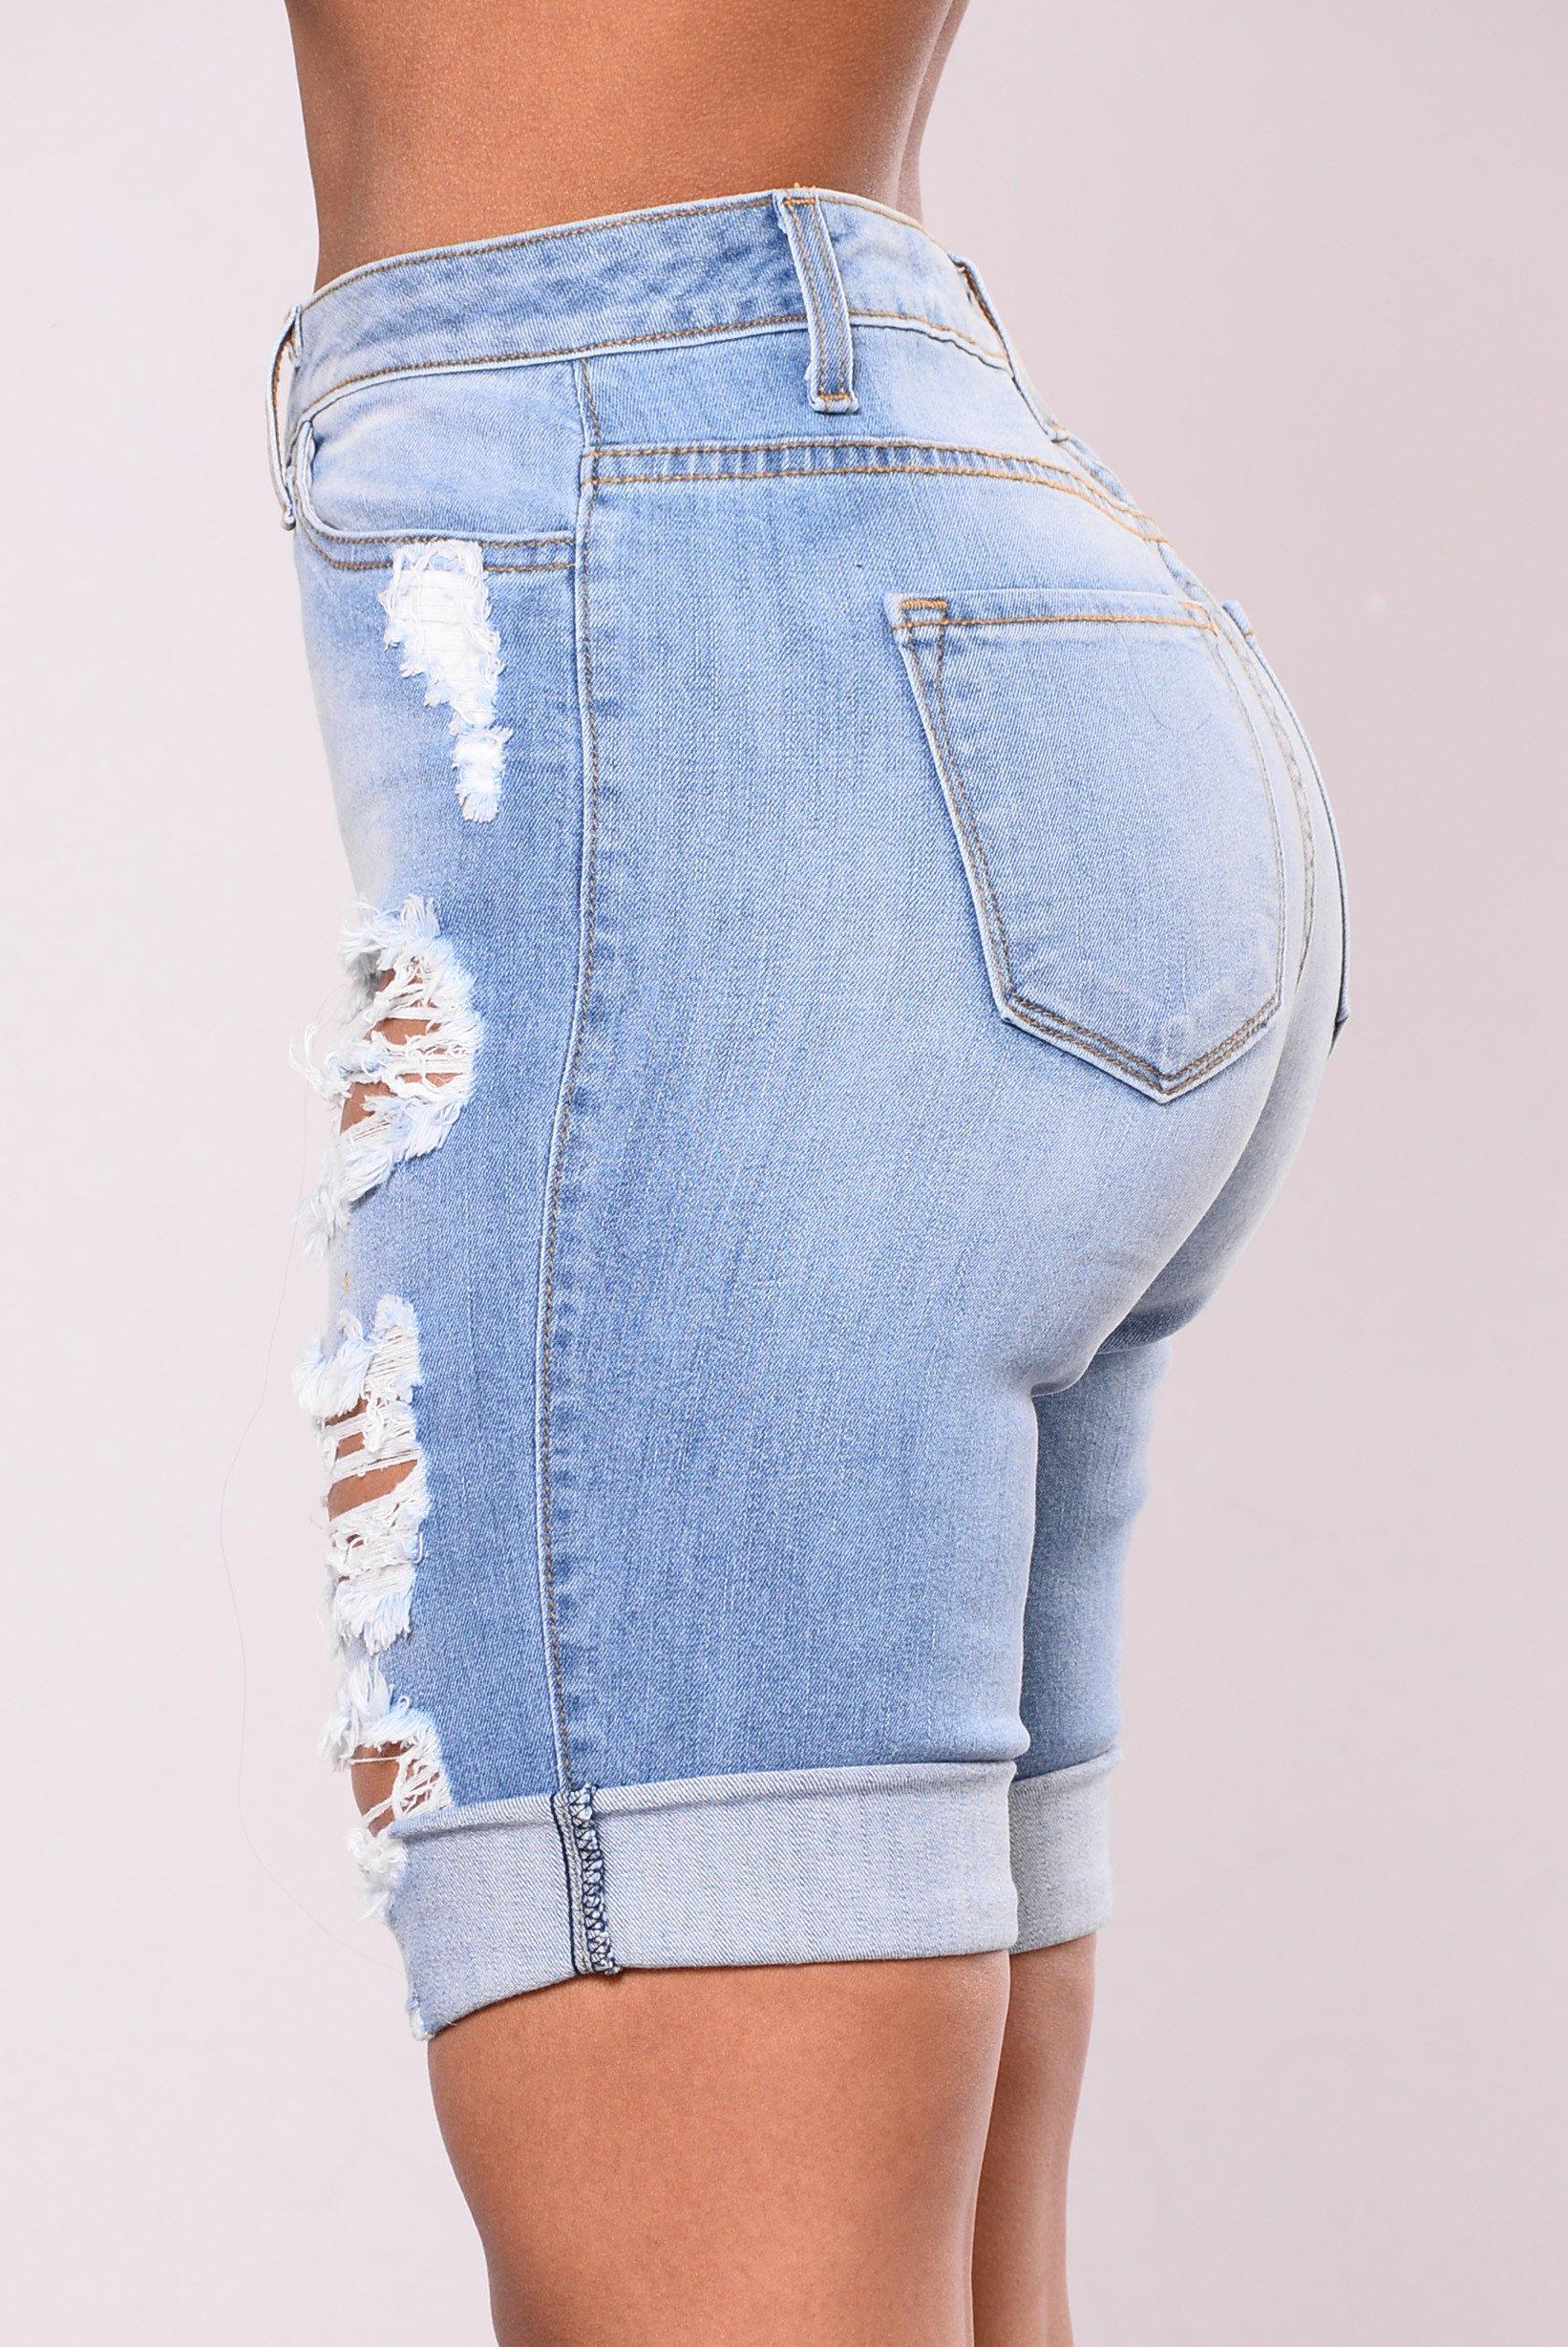 Bermuda Shorts shipwrecked bermuda shorts - denim blue IAXXSAY